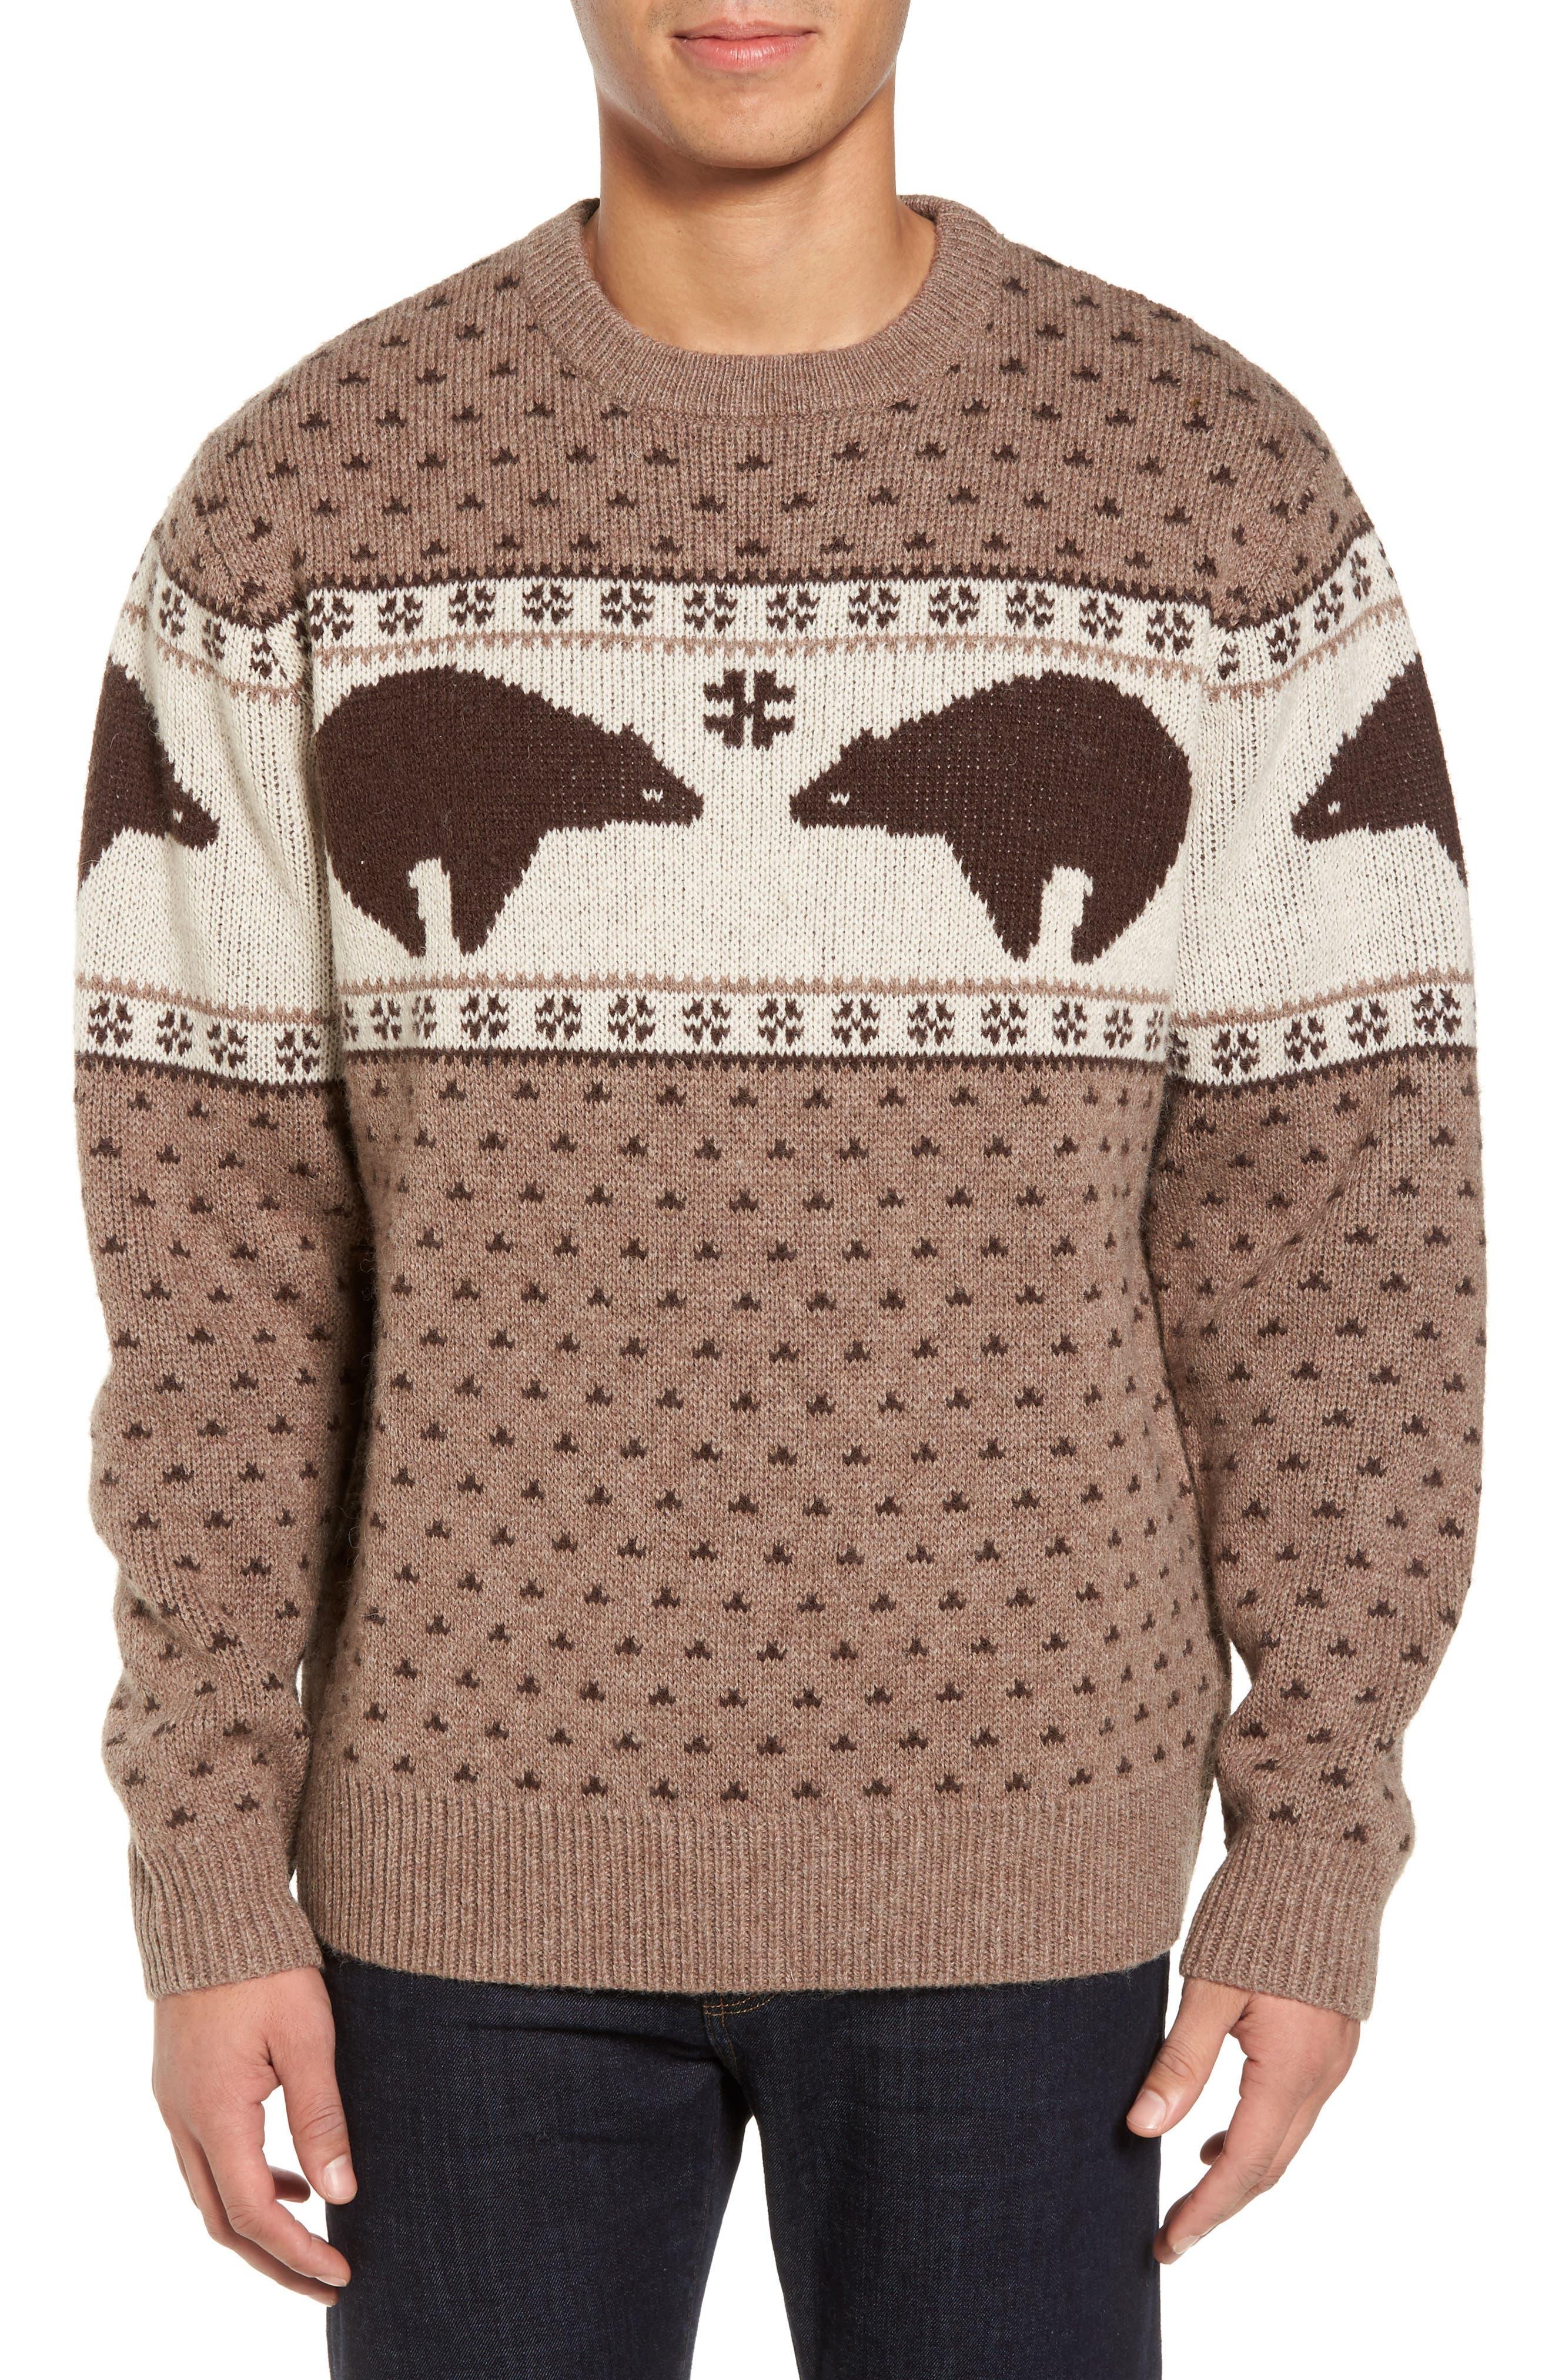 Bear Sweater,                             Main thumbnail 1, color,                             Brown/ Ivory Bear